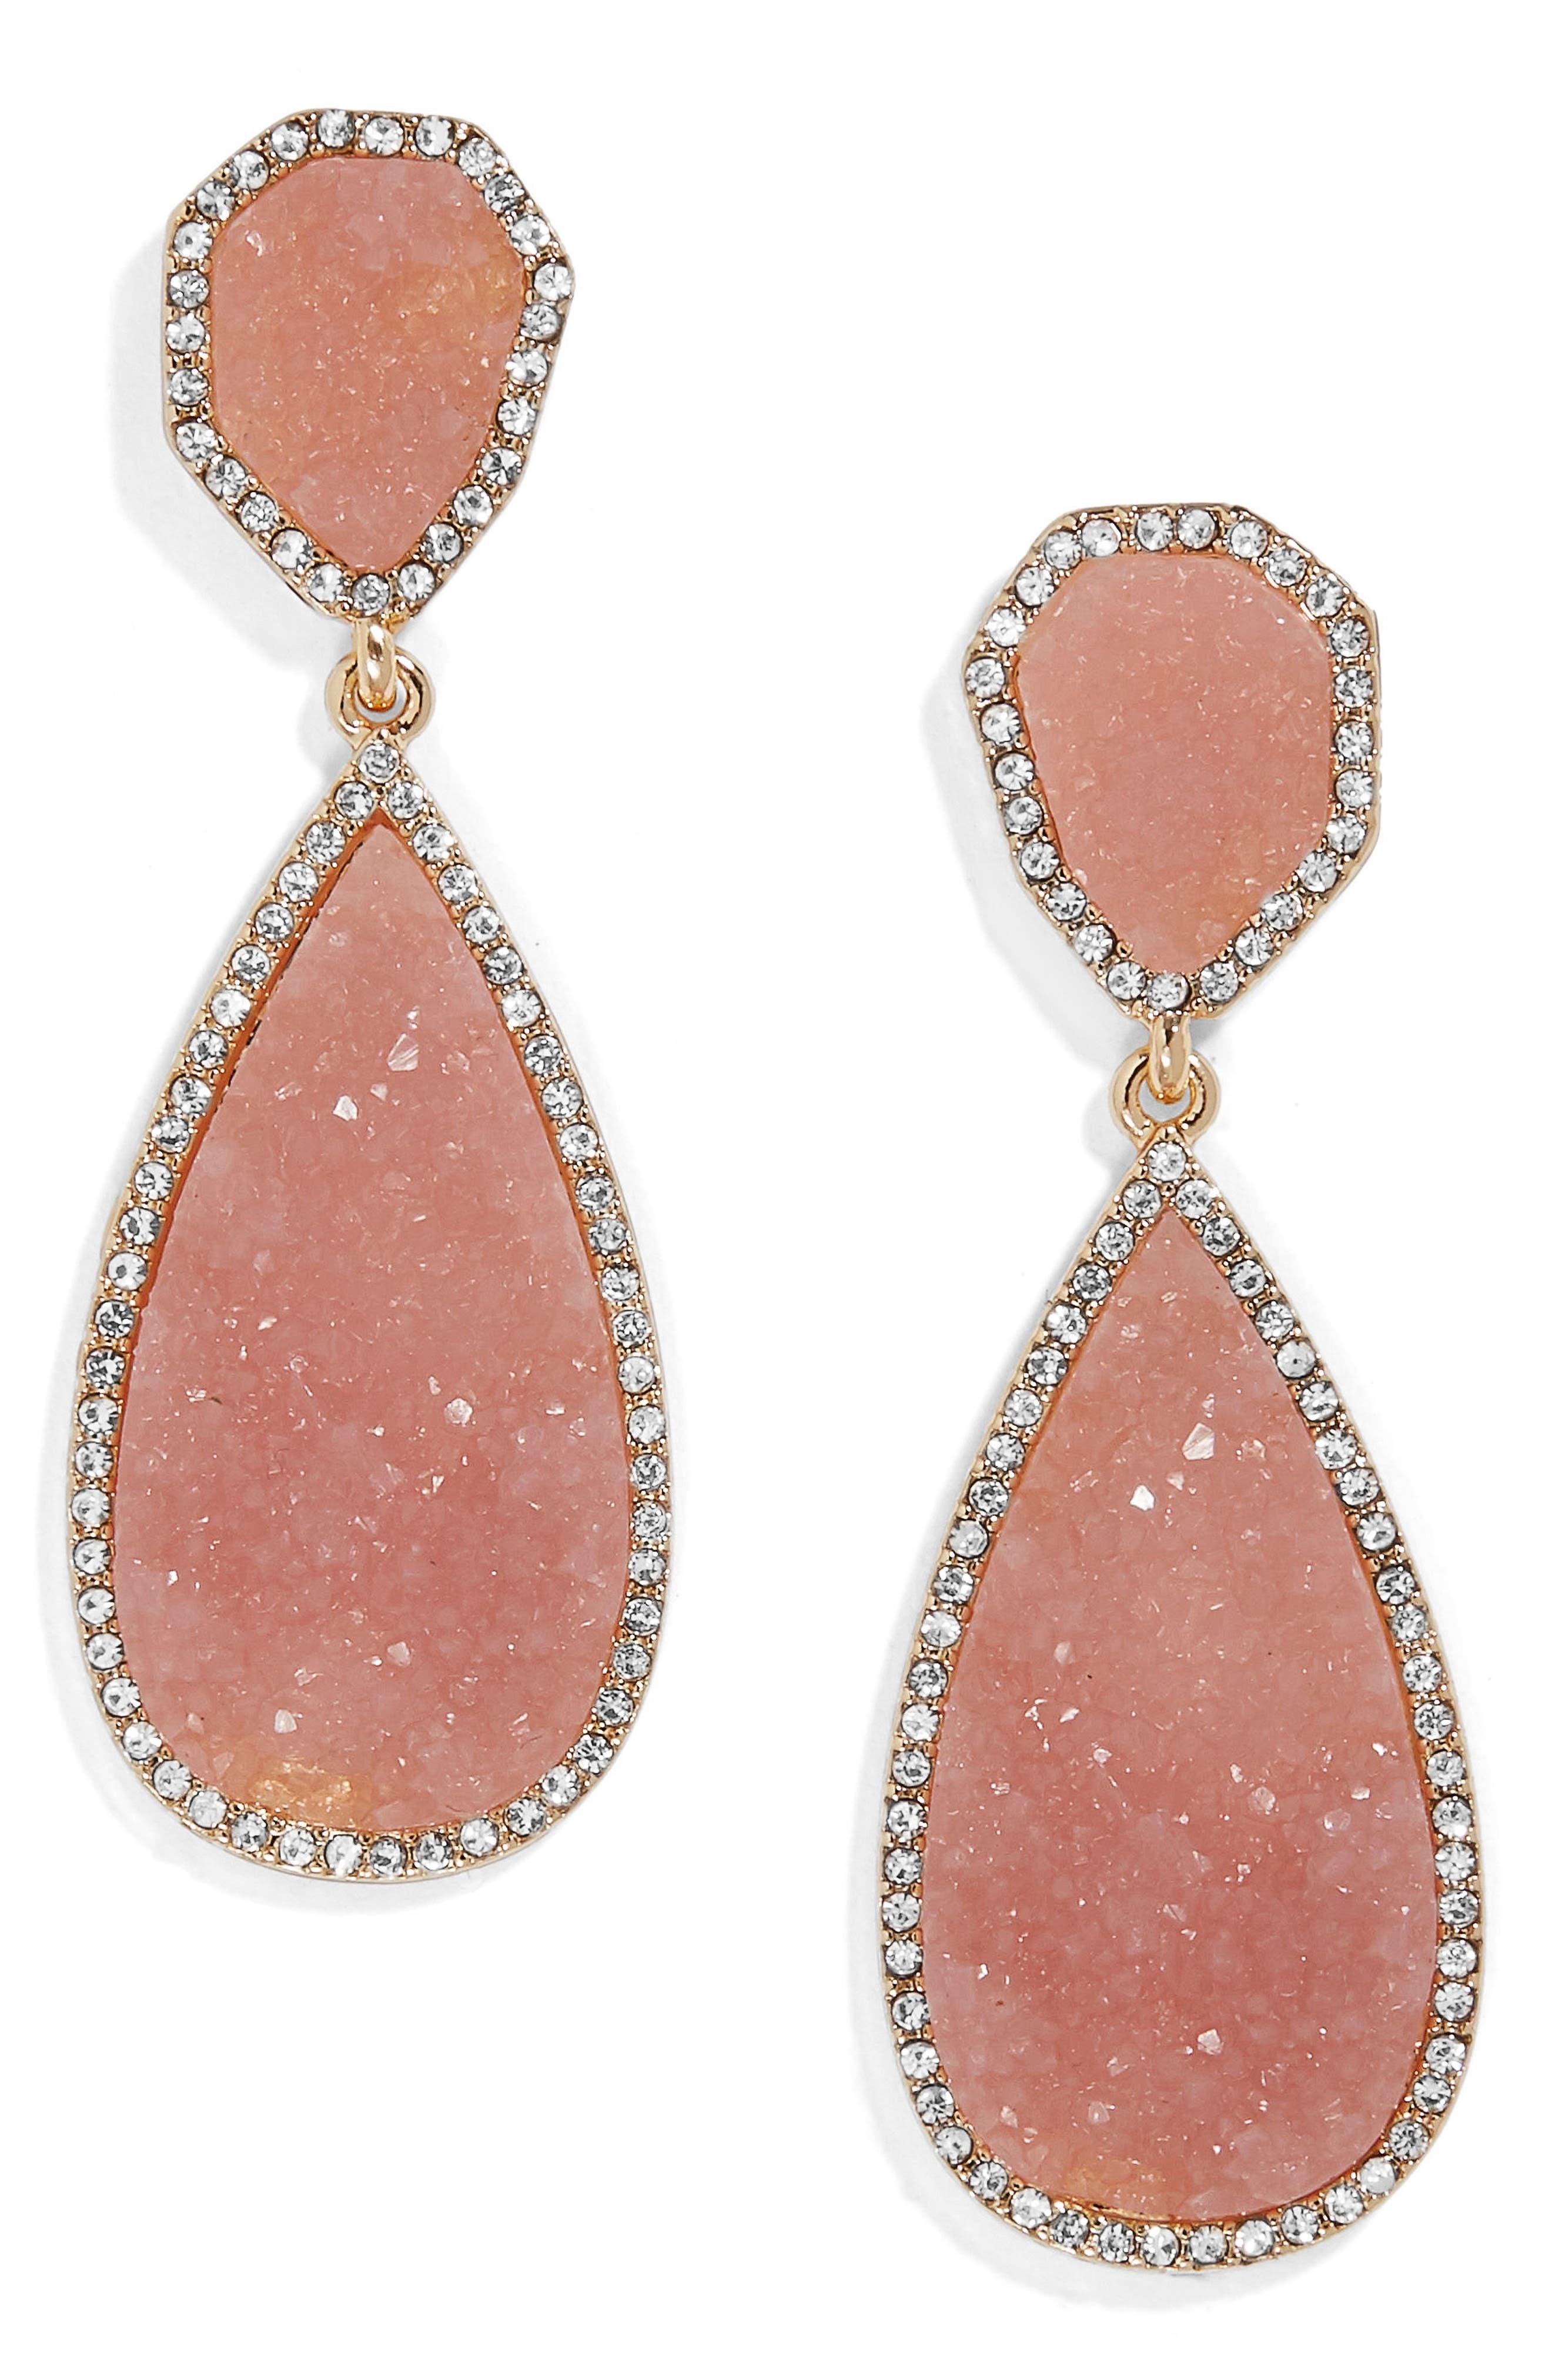 Moonlight Drop Earrings,                         Main,                         color, Pink